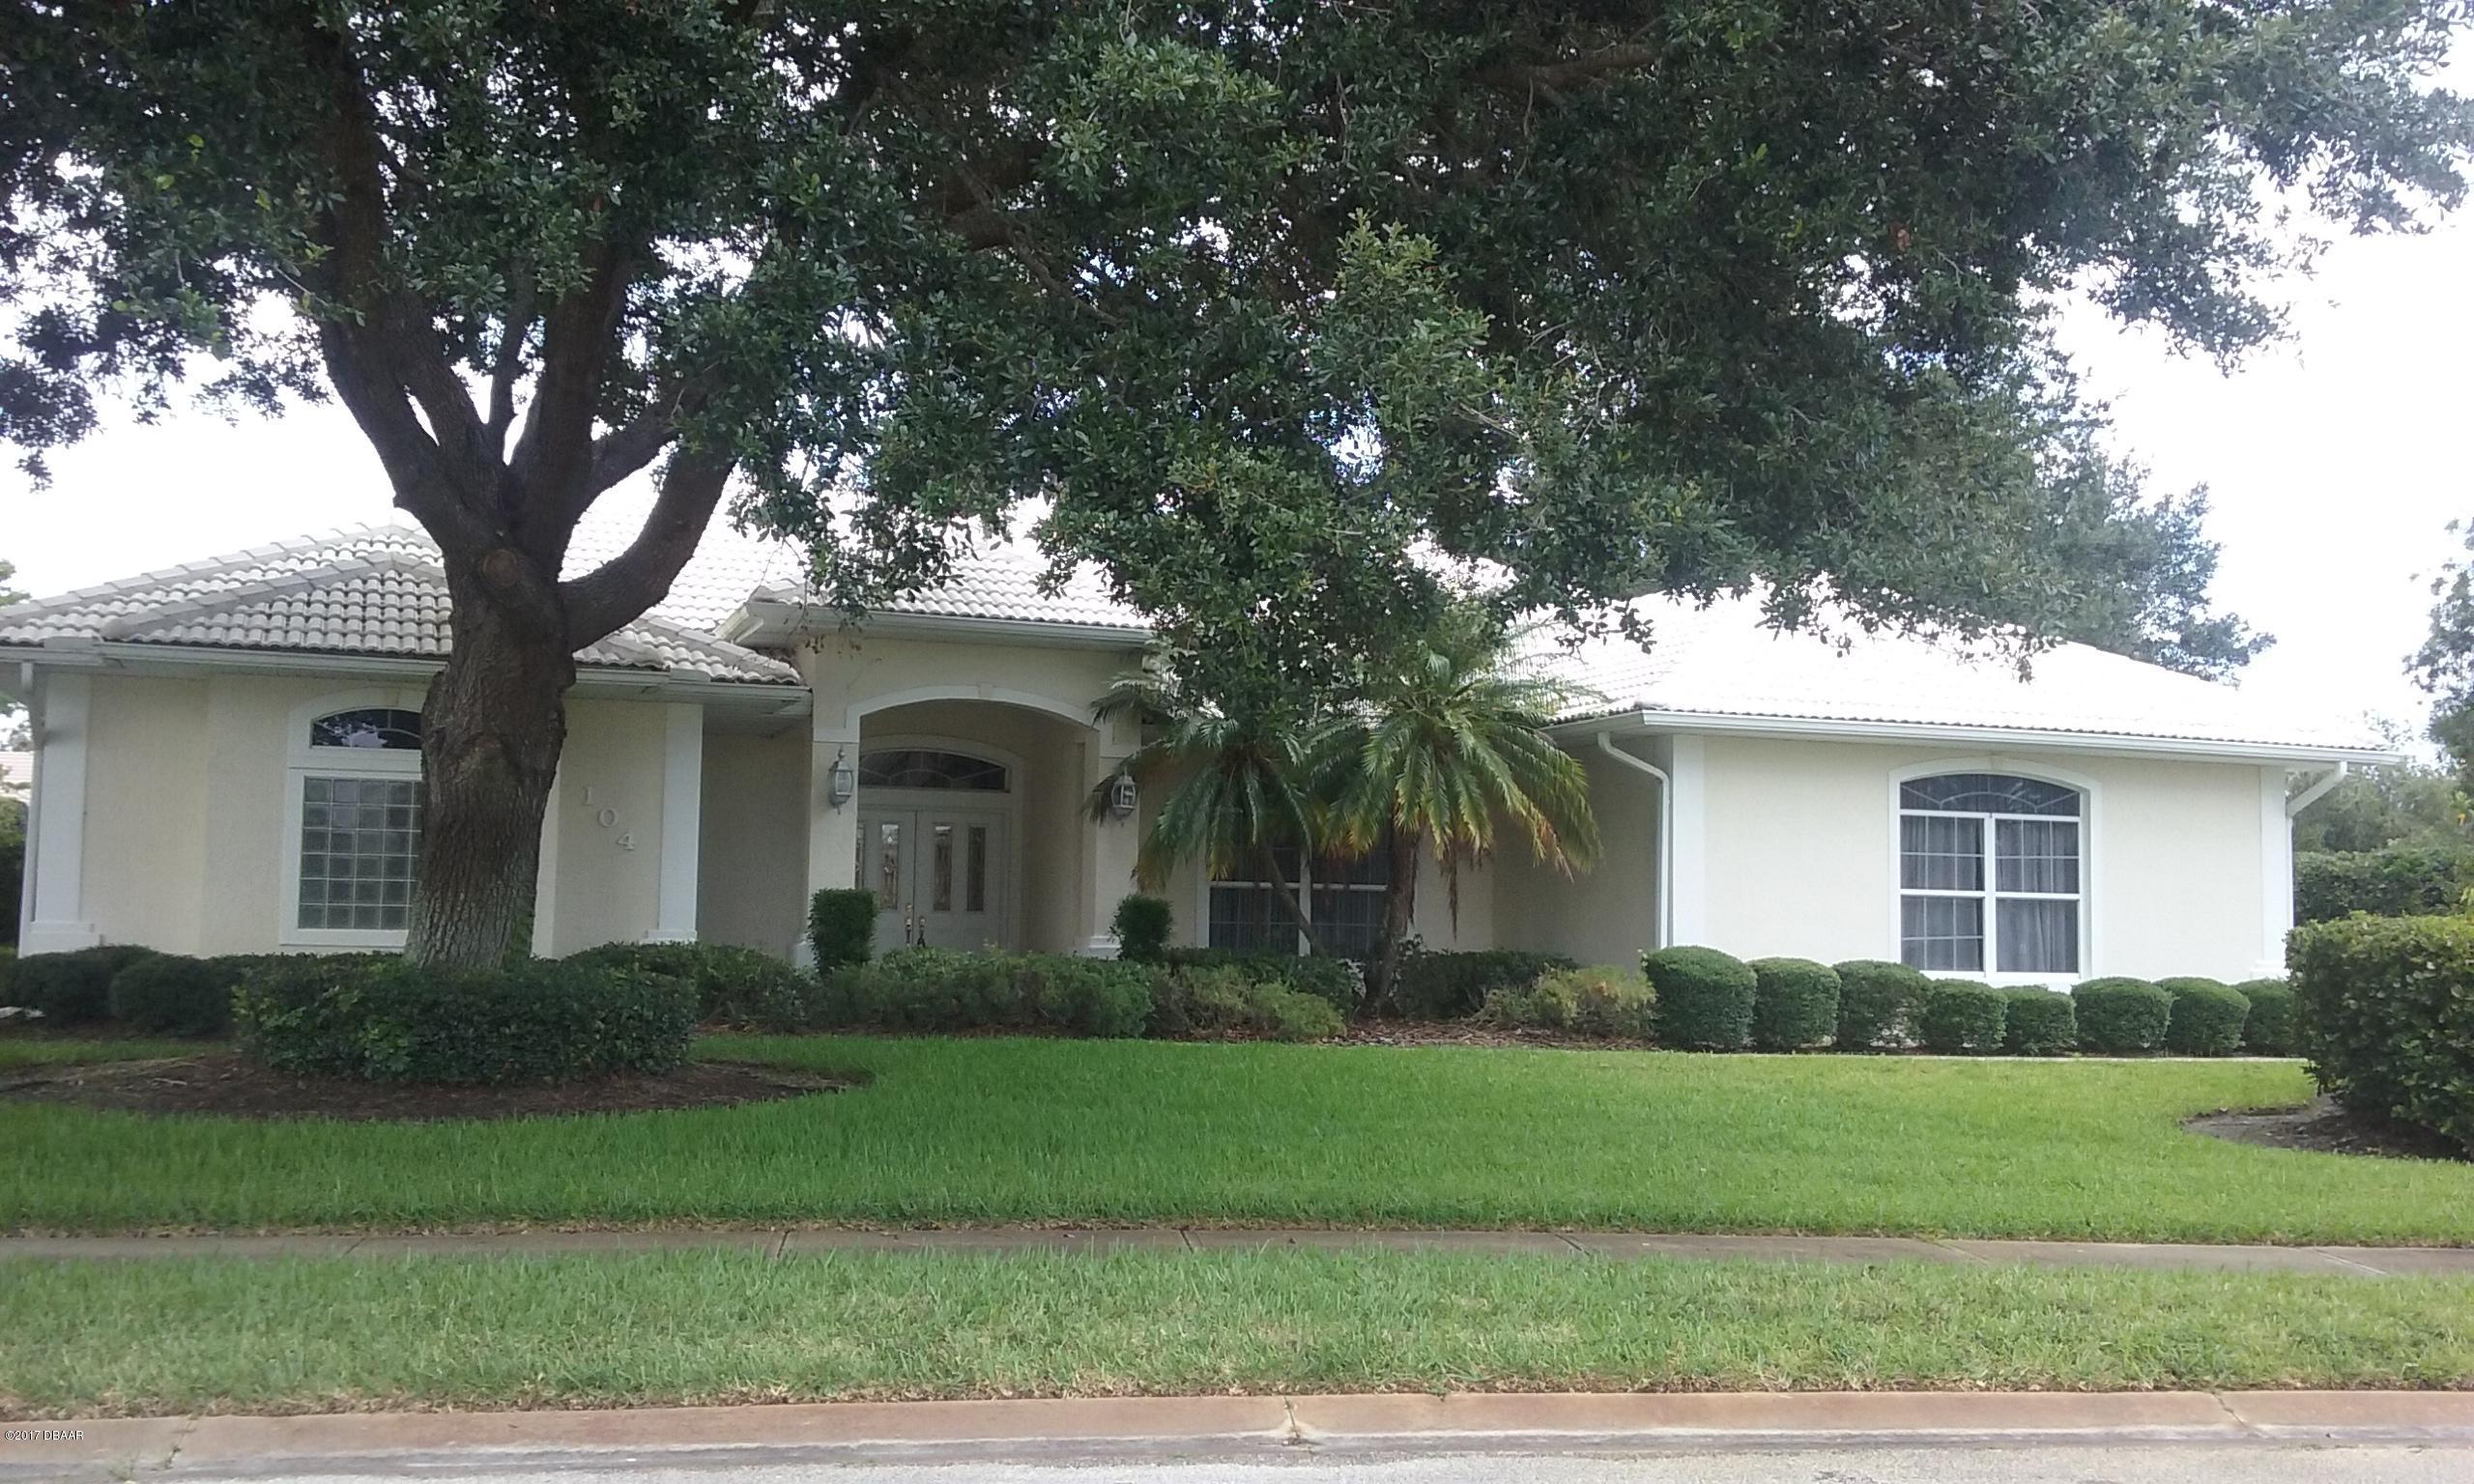 104 King Eider Court, Daytona Beach, FL 32119